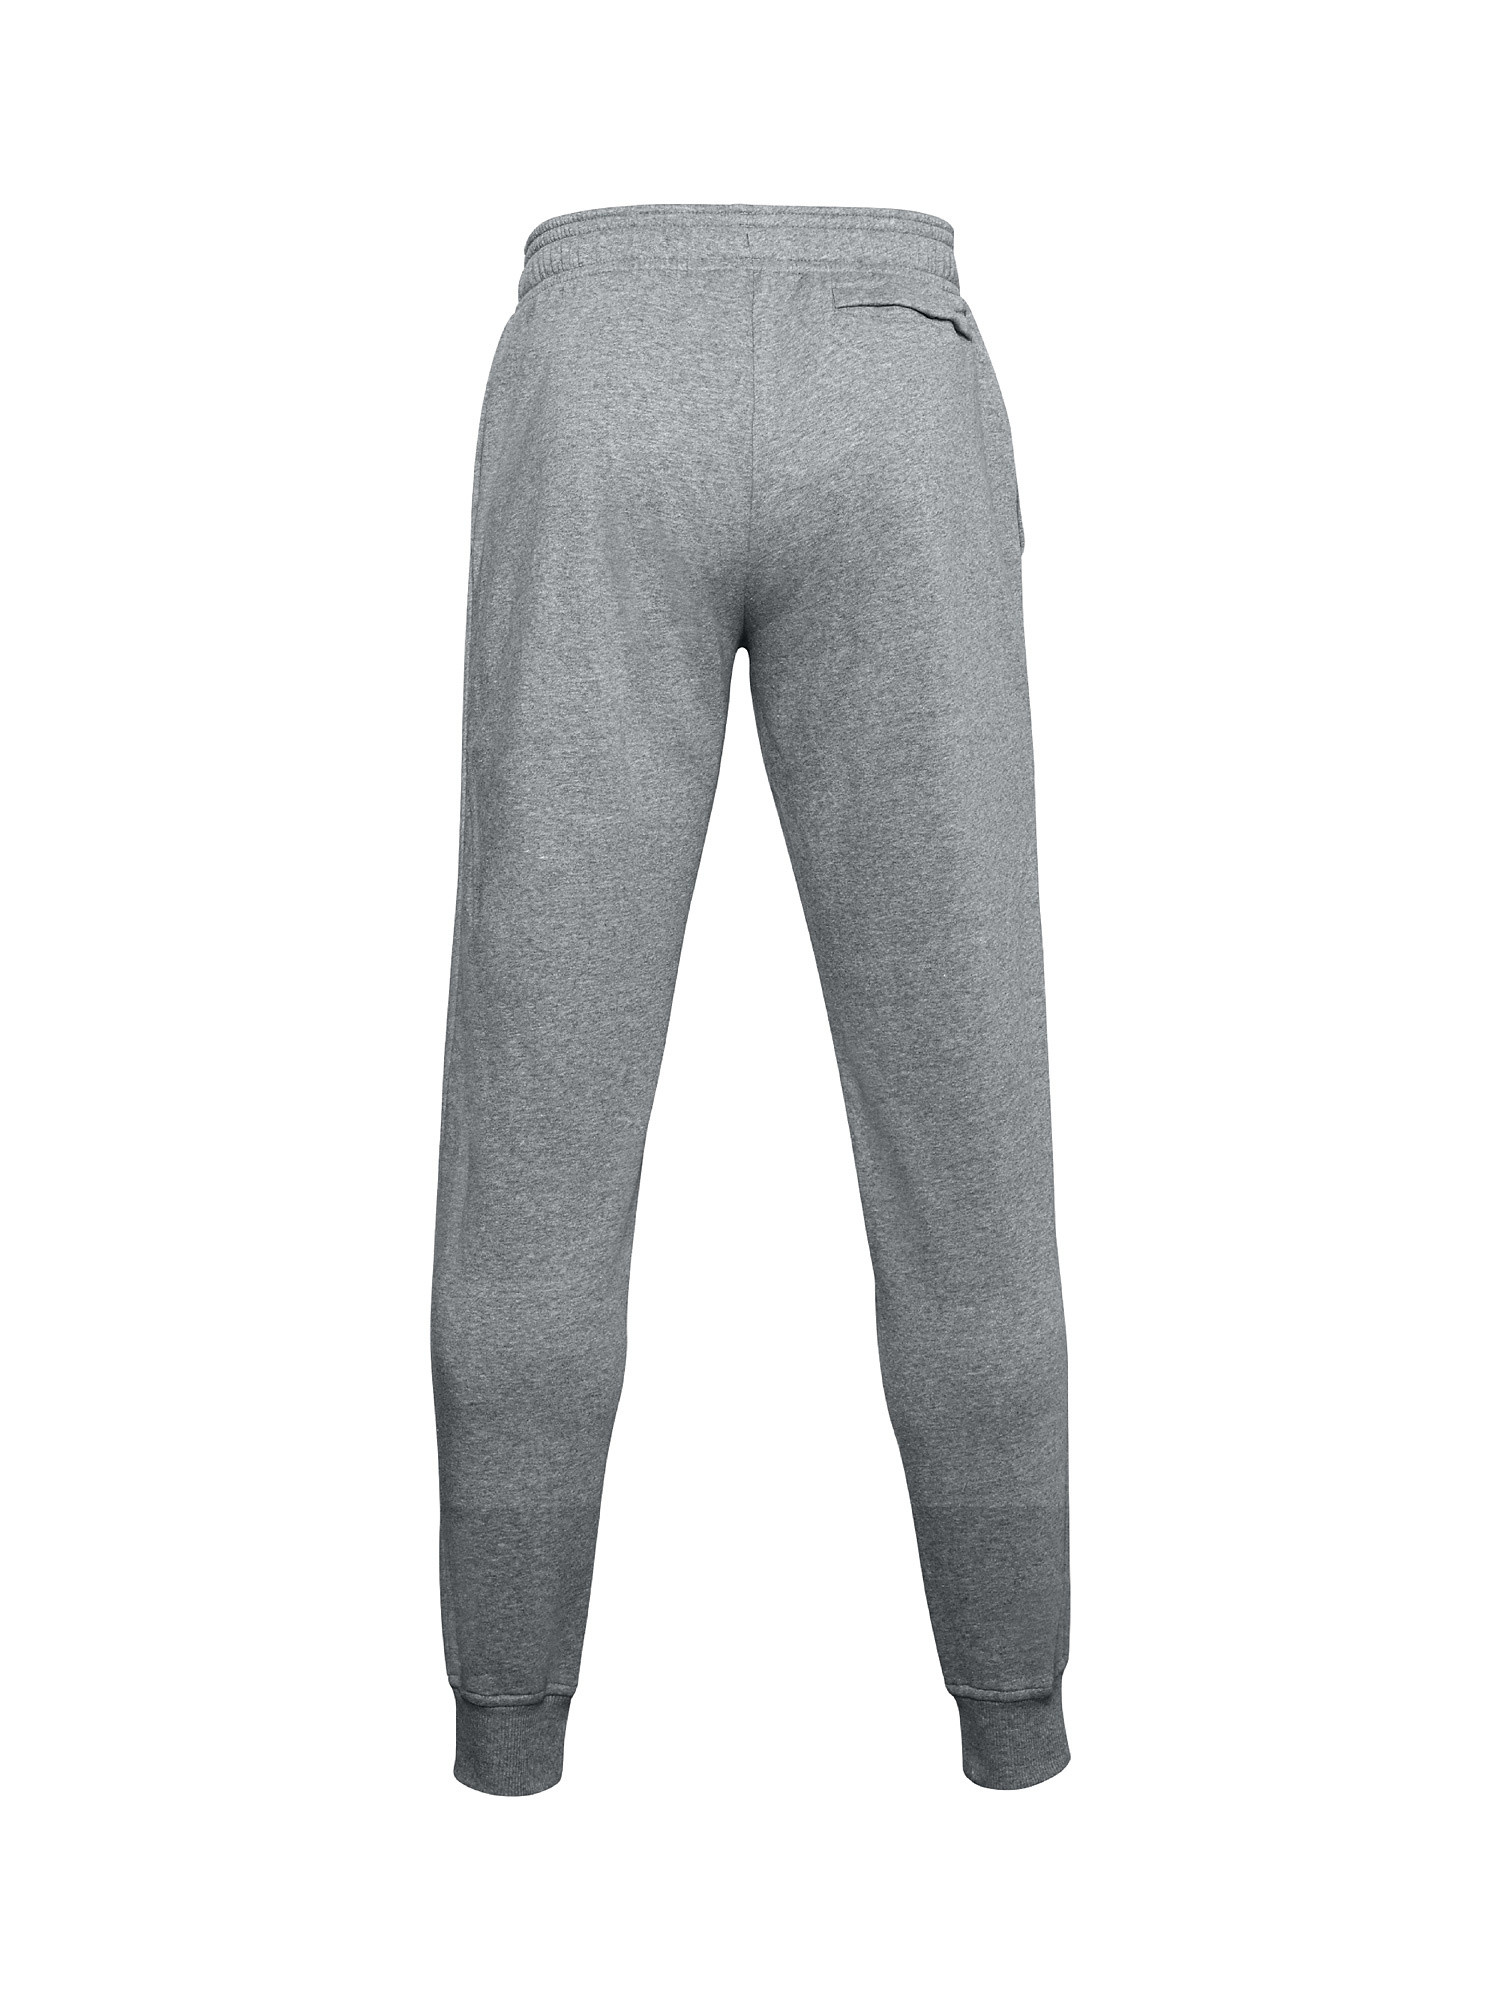 Pantaloni sportivi, Grigio, large image number 1